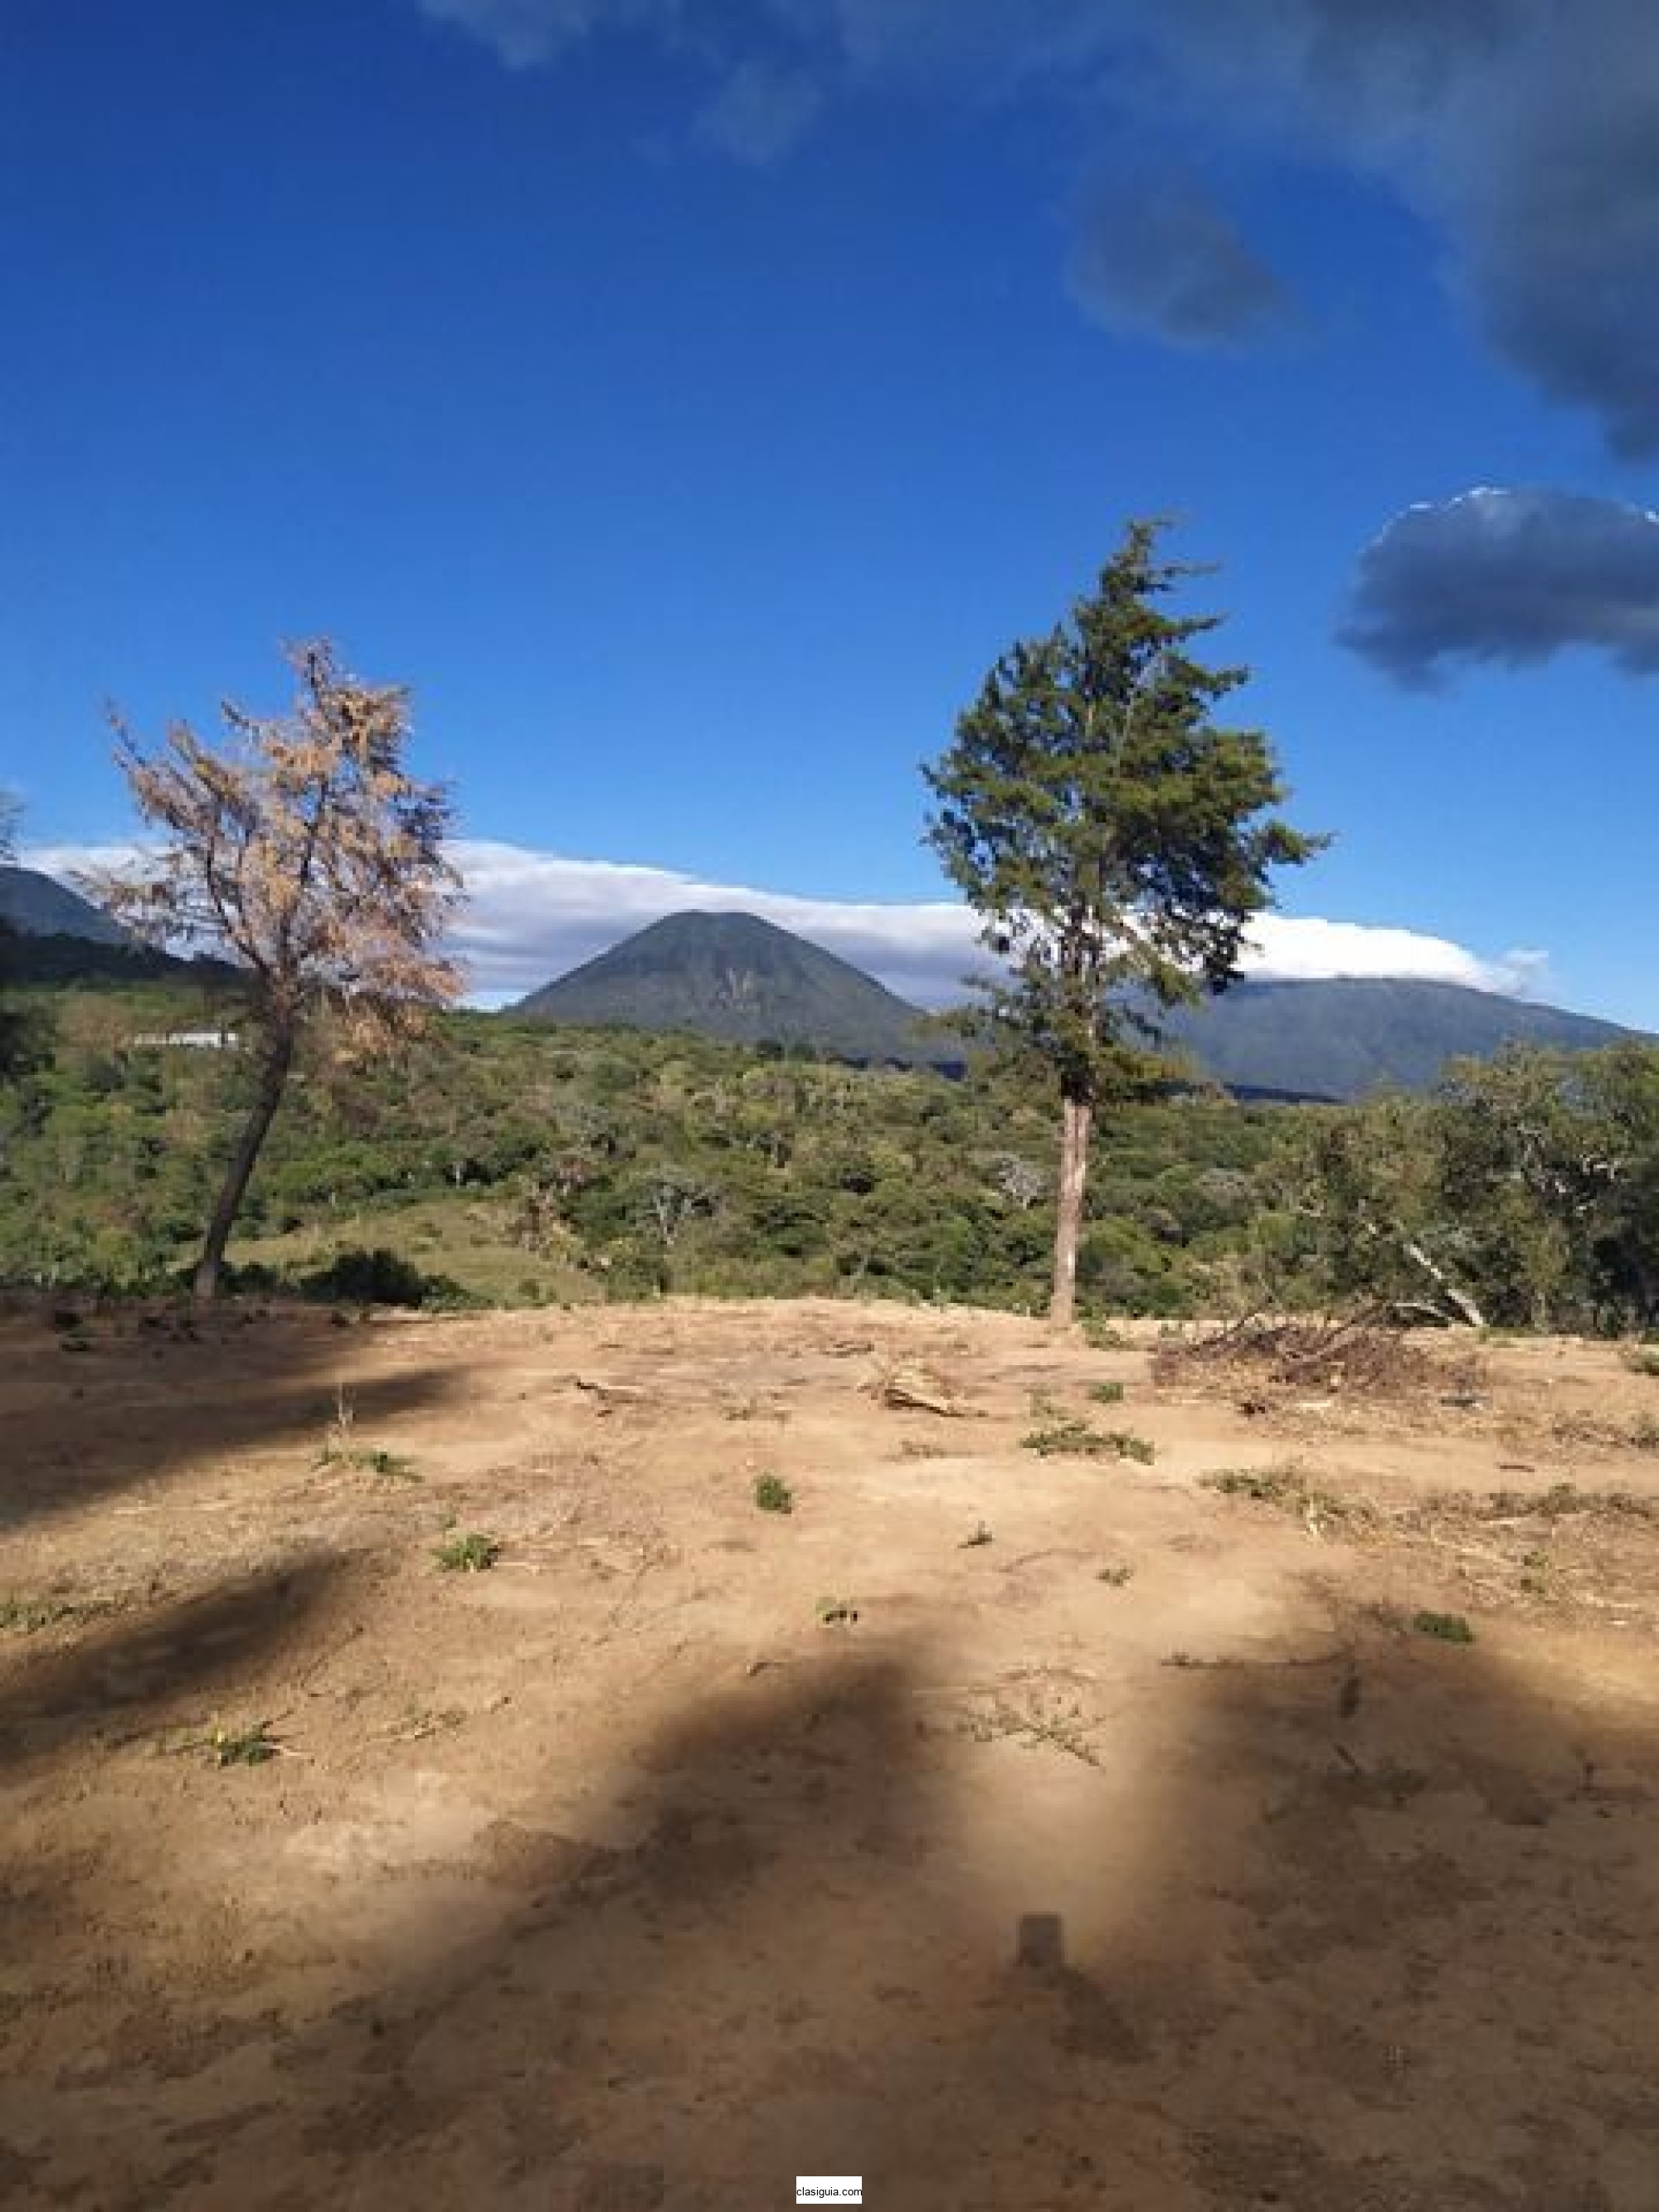 Vendo terreno en Juayua, Sonsonate, parcial o total, área 5,600 V2